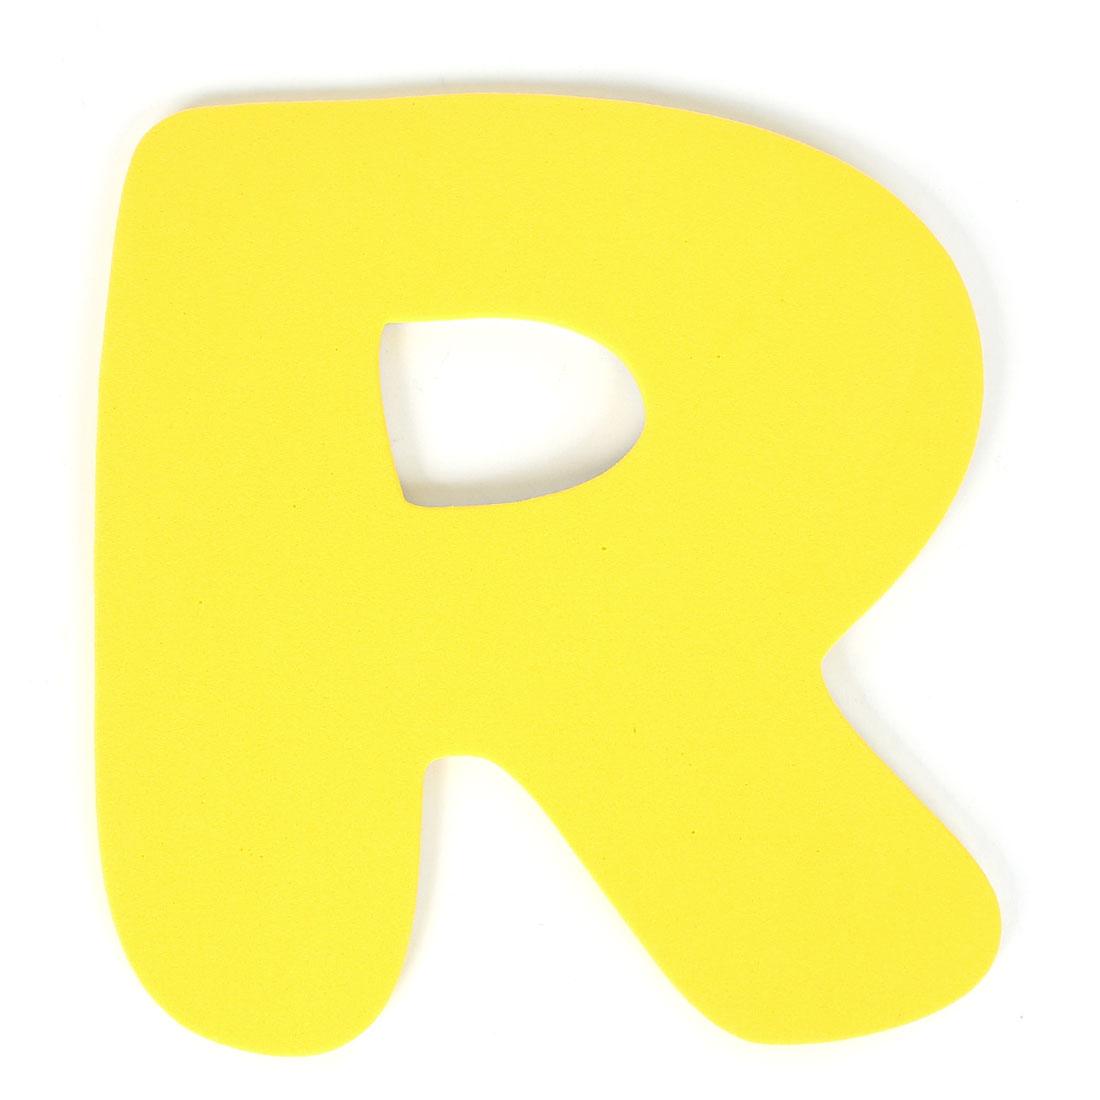 Home Bathroom Decor Letter R Shape Foam 3D Wall Sticker Decal DIY Yellow